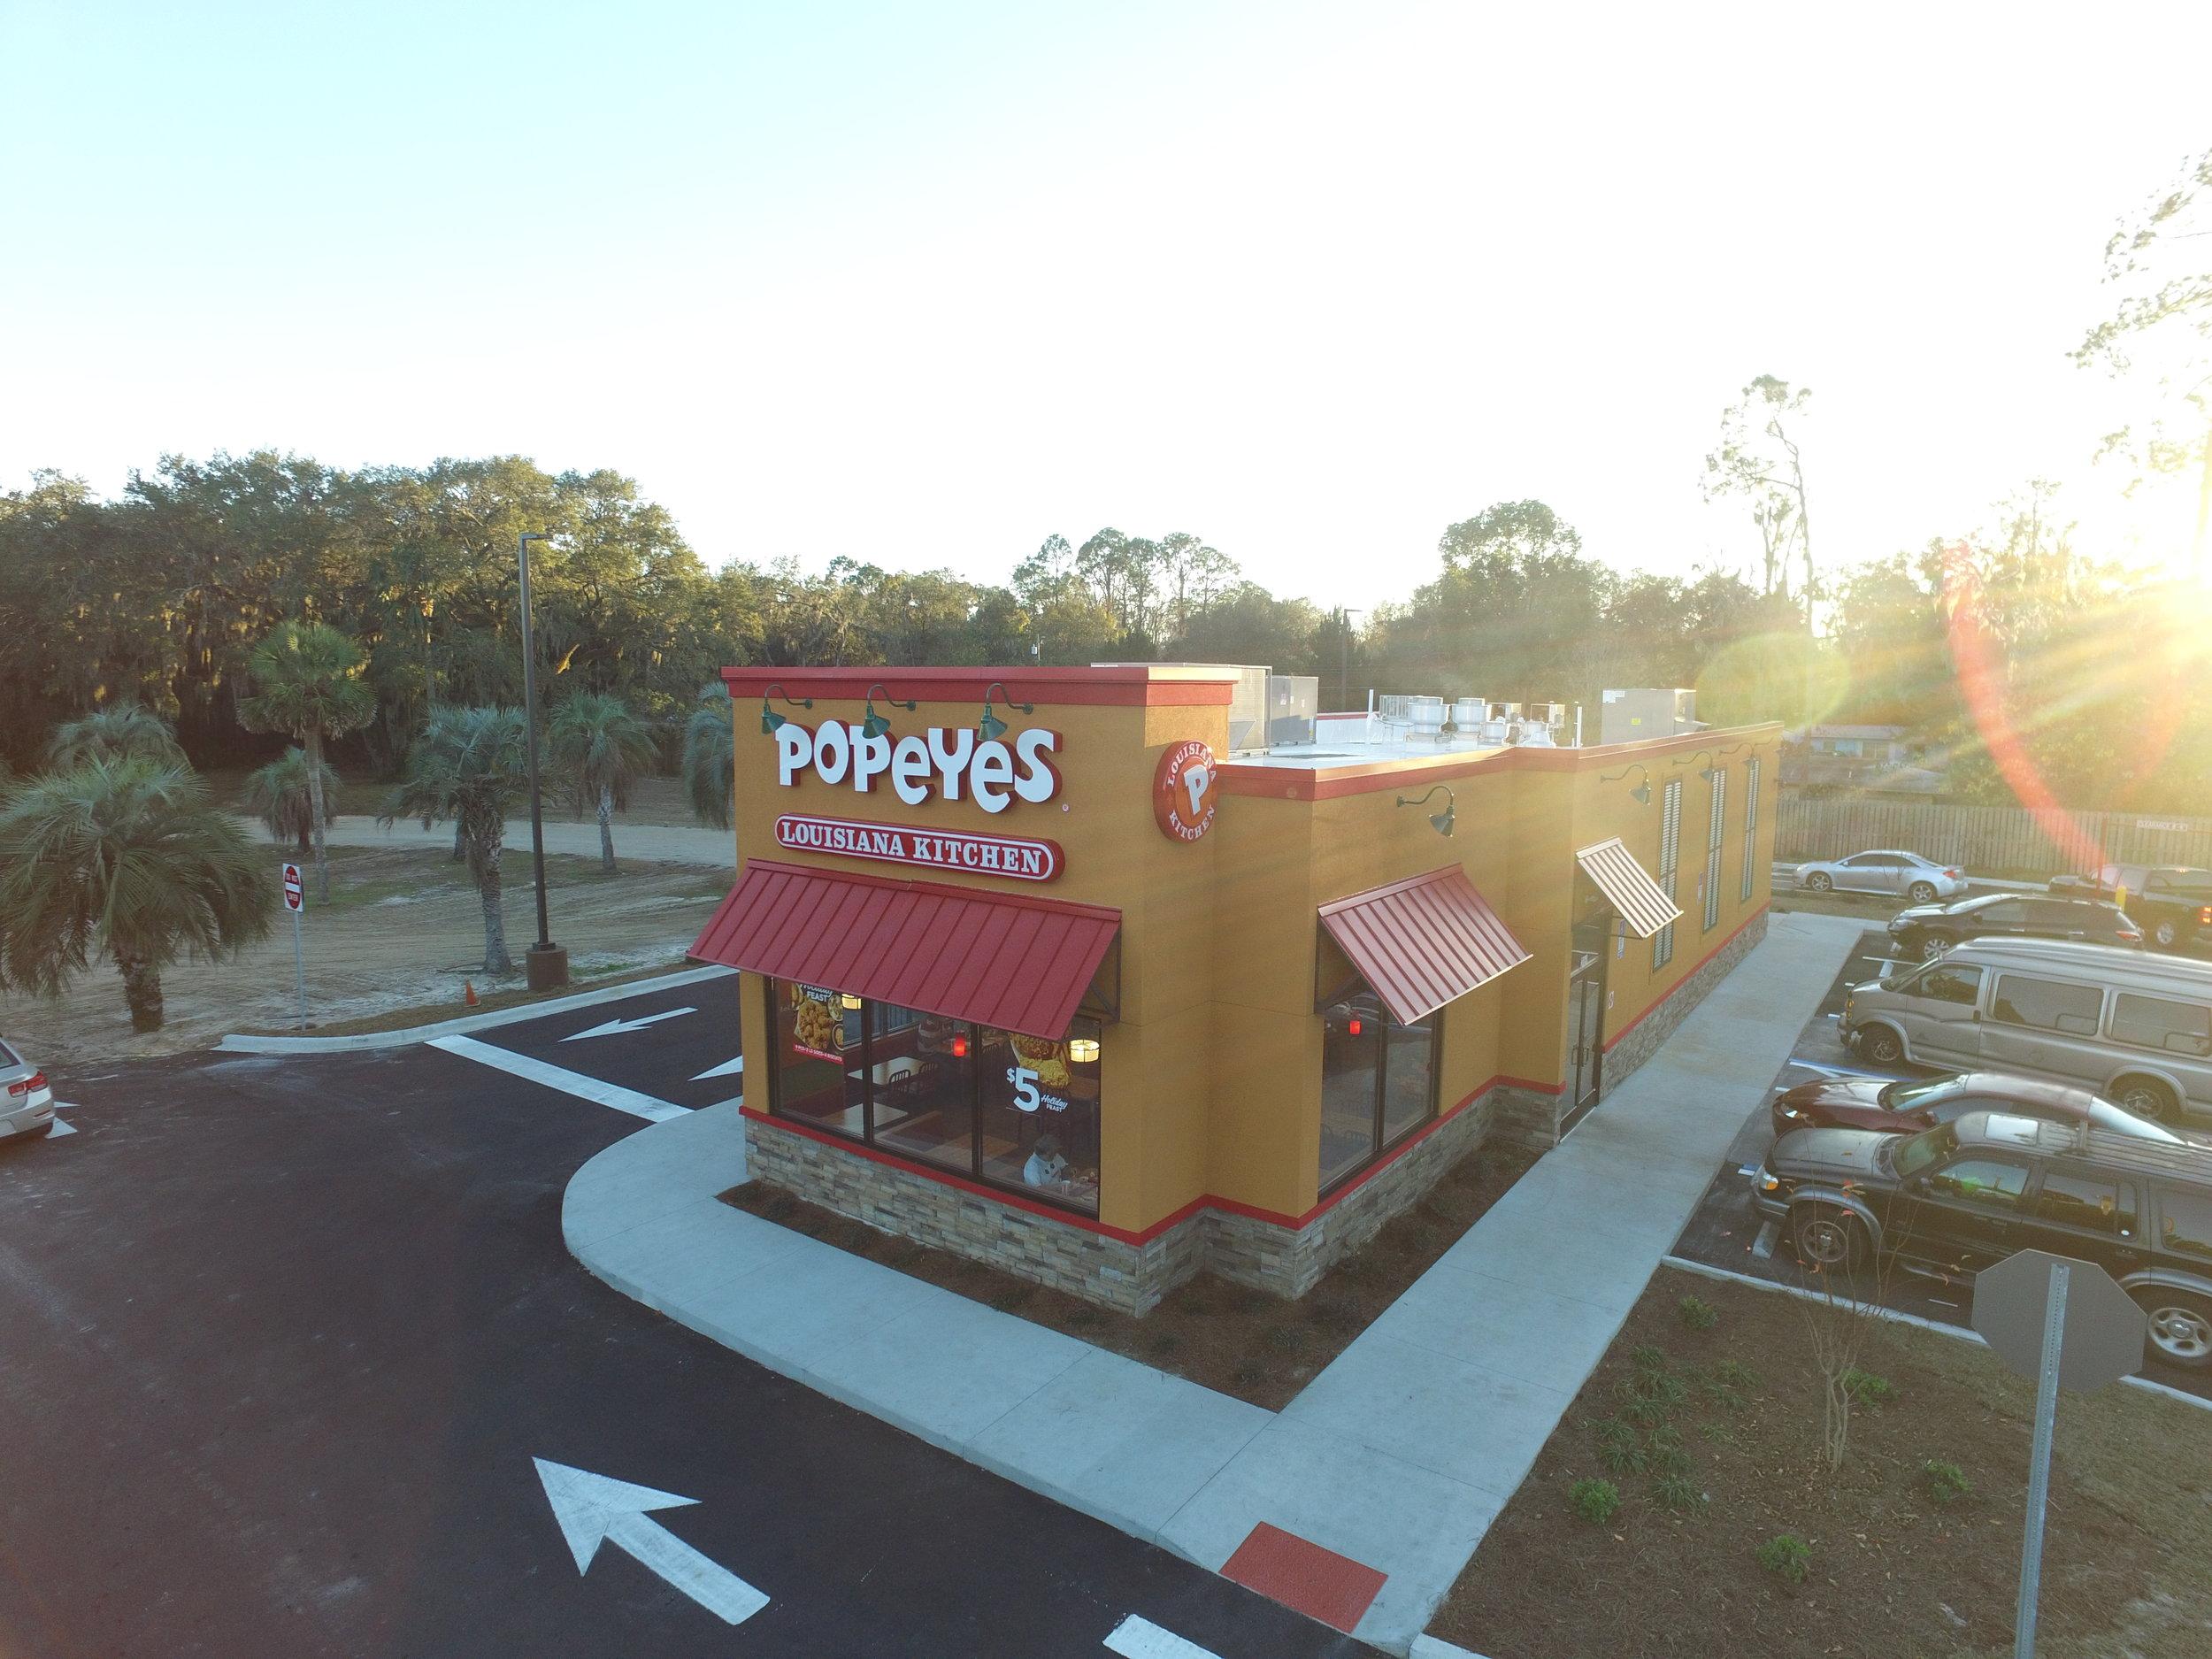 Verdad project - Peopeye's & Taco Bell - Perry, FL - 20.JPG